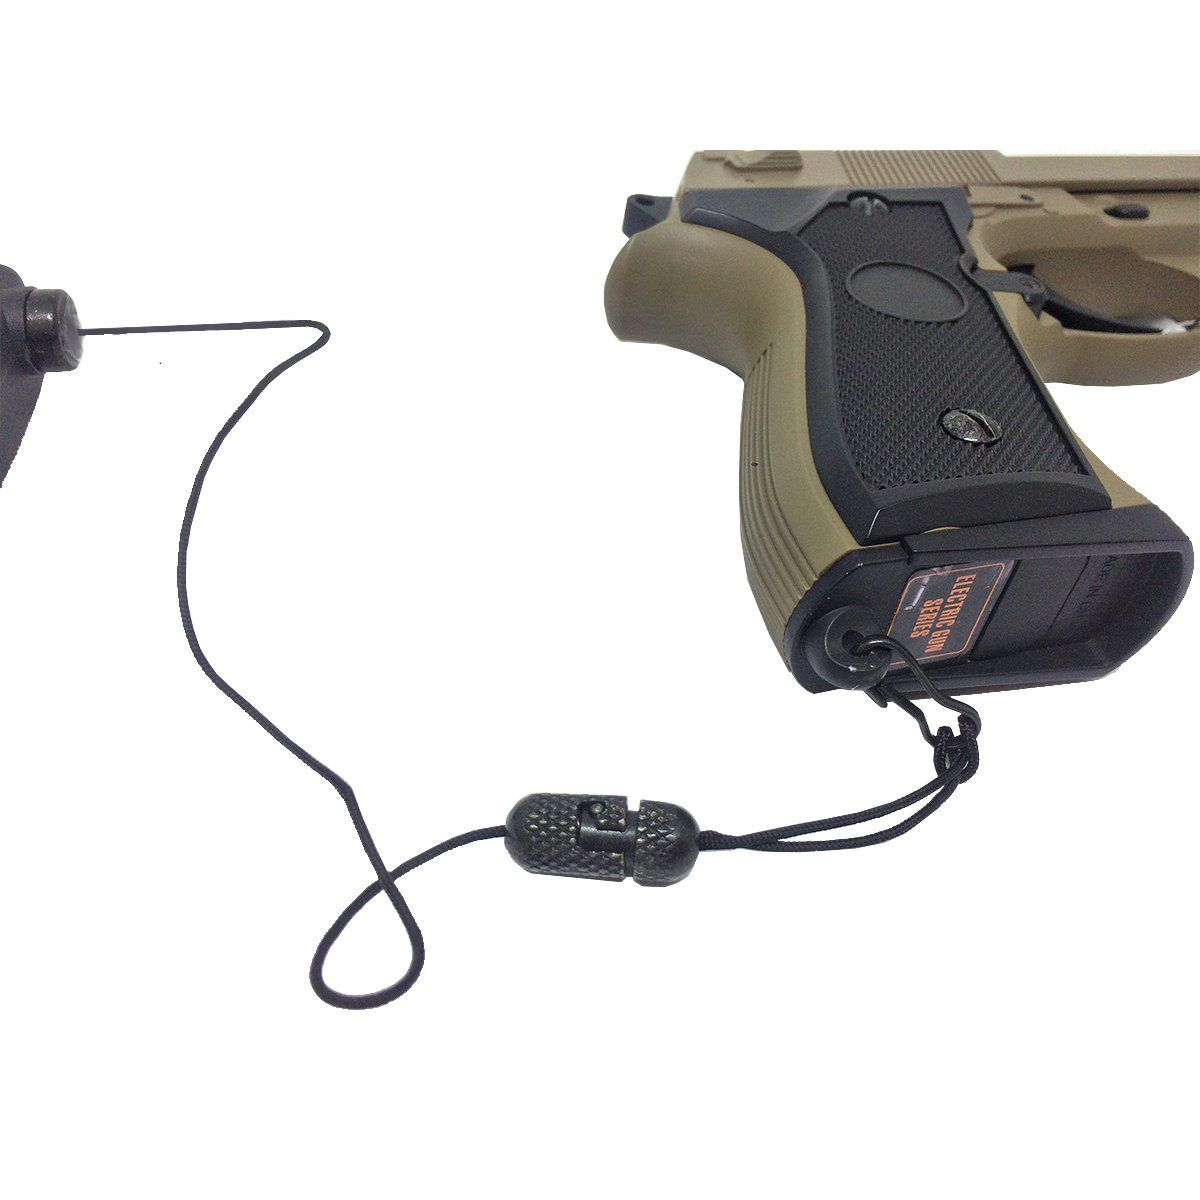 Fiel Retrátil Liso Para Pistola de Airsoft Bélica Preto